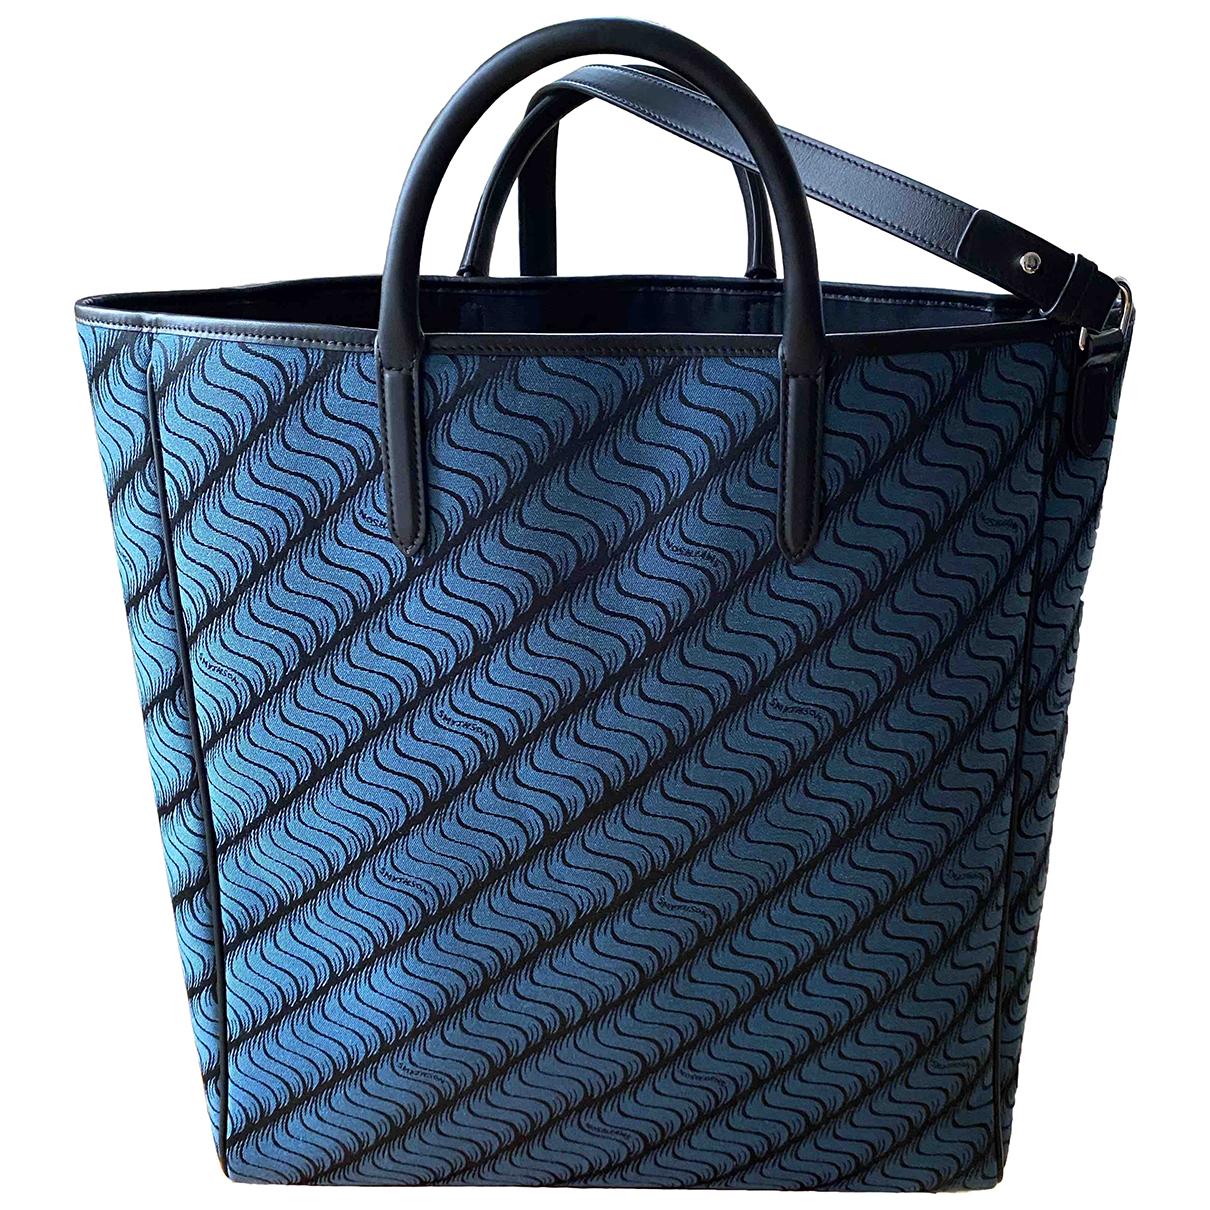 Smythson N Blue Leather handbag for Women N